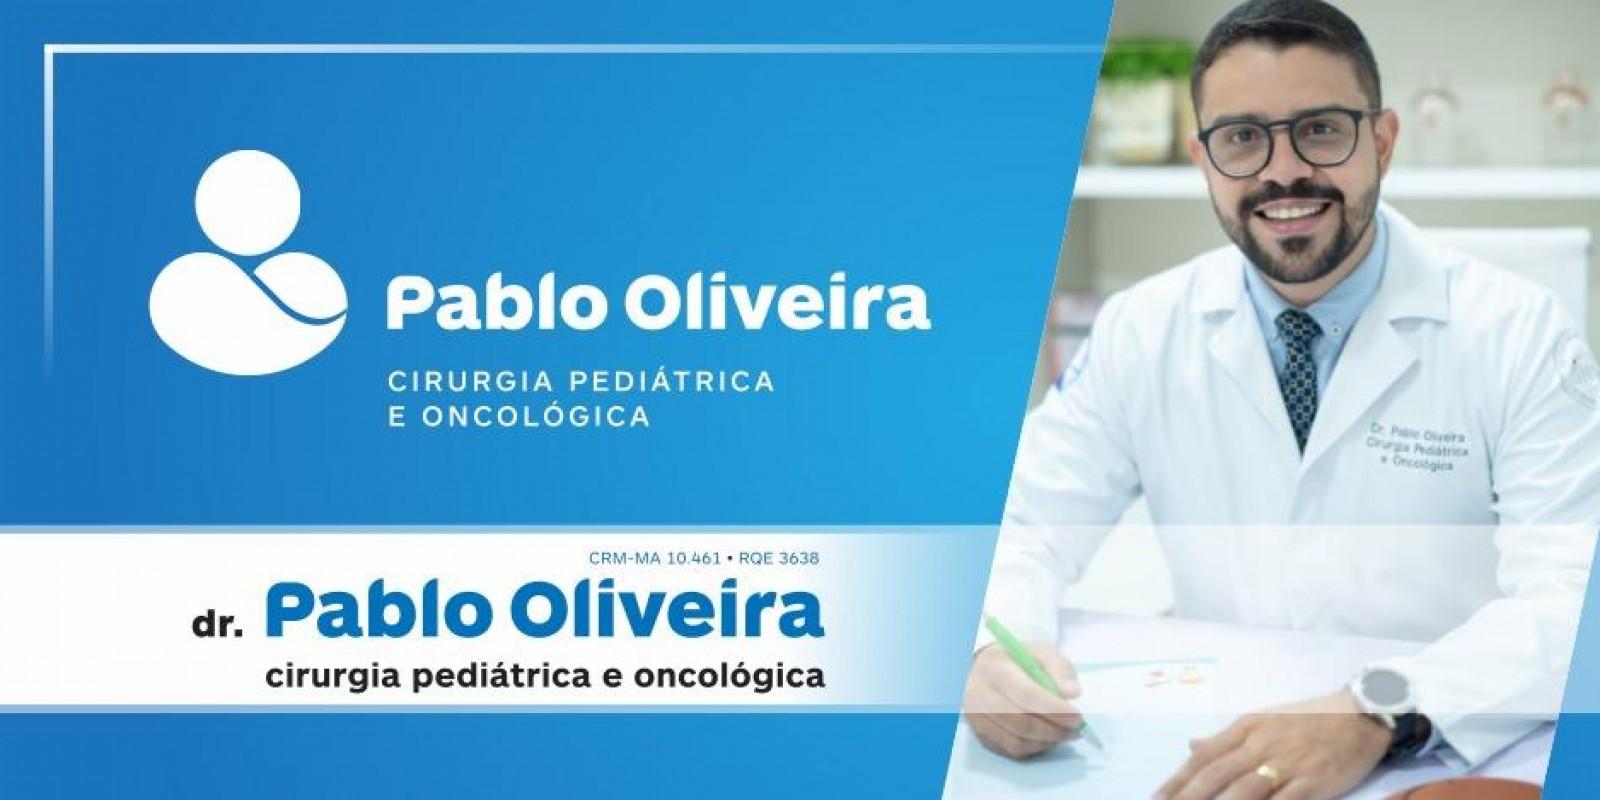 Pablo Baptista Oliveira